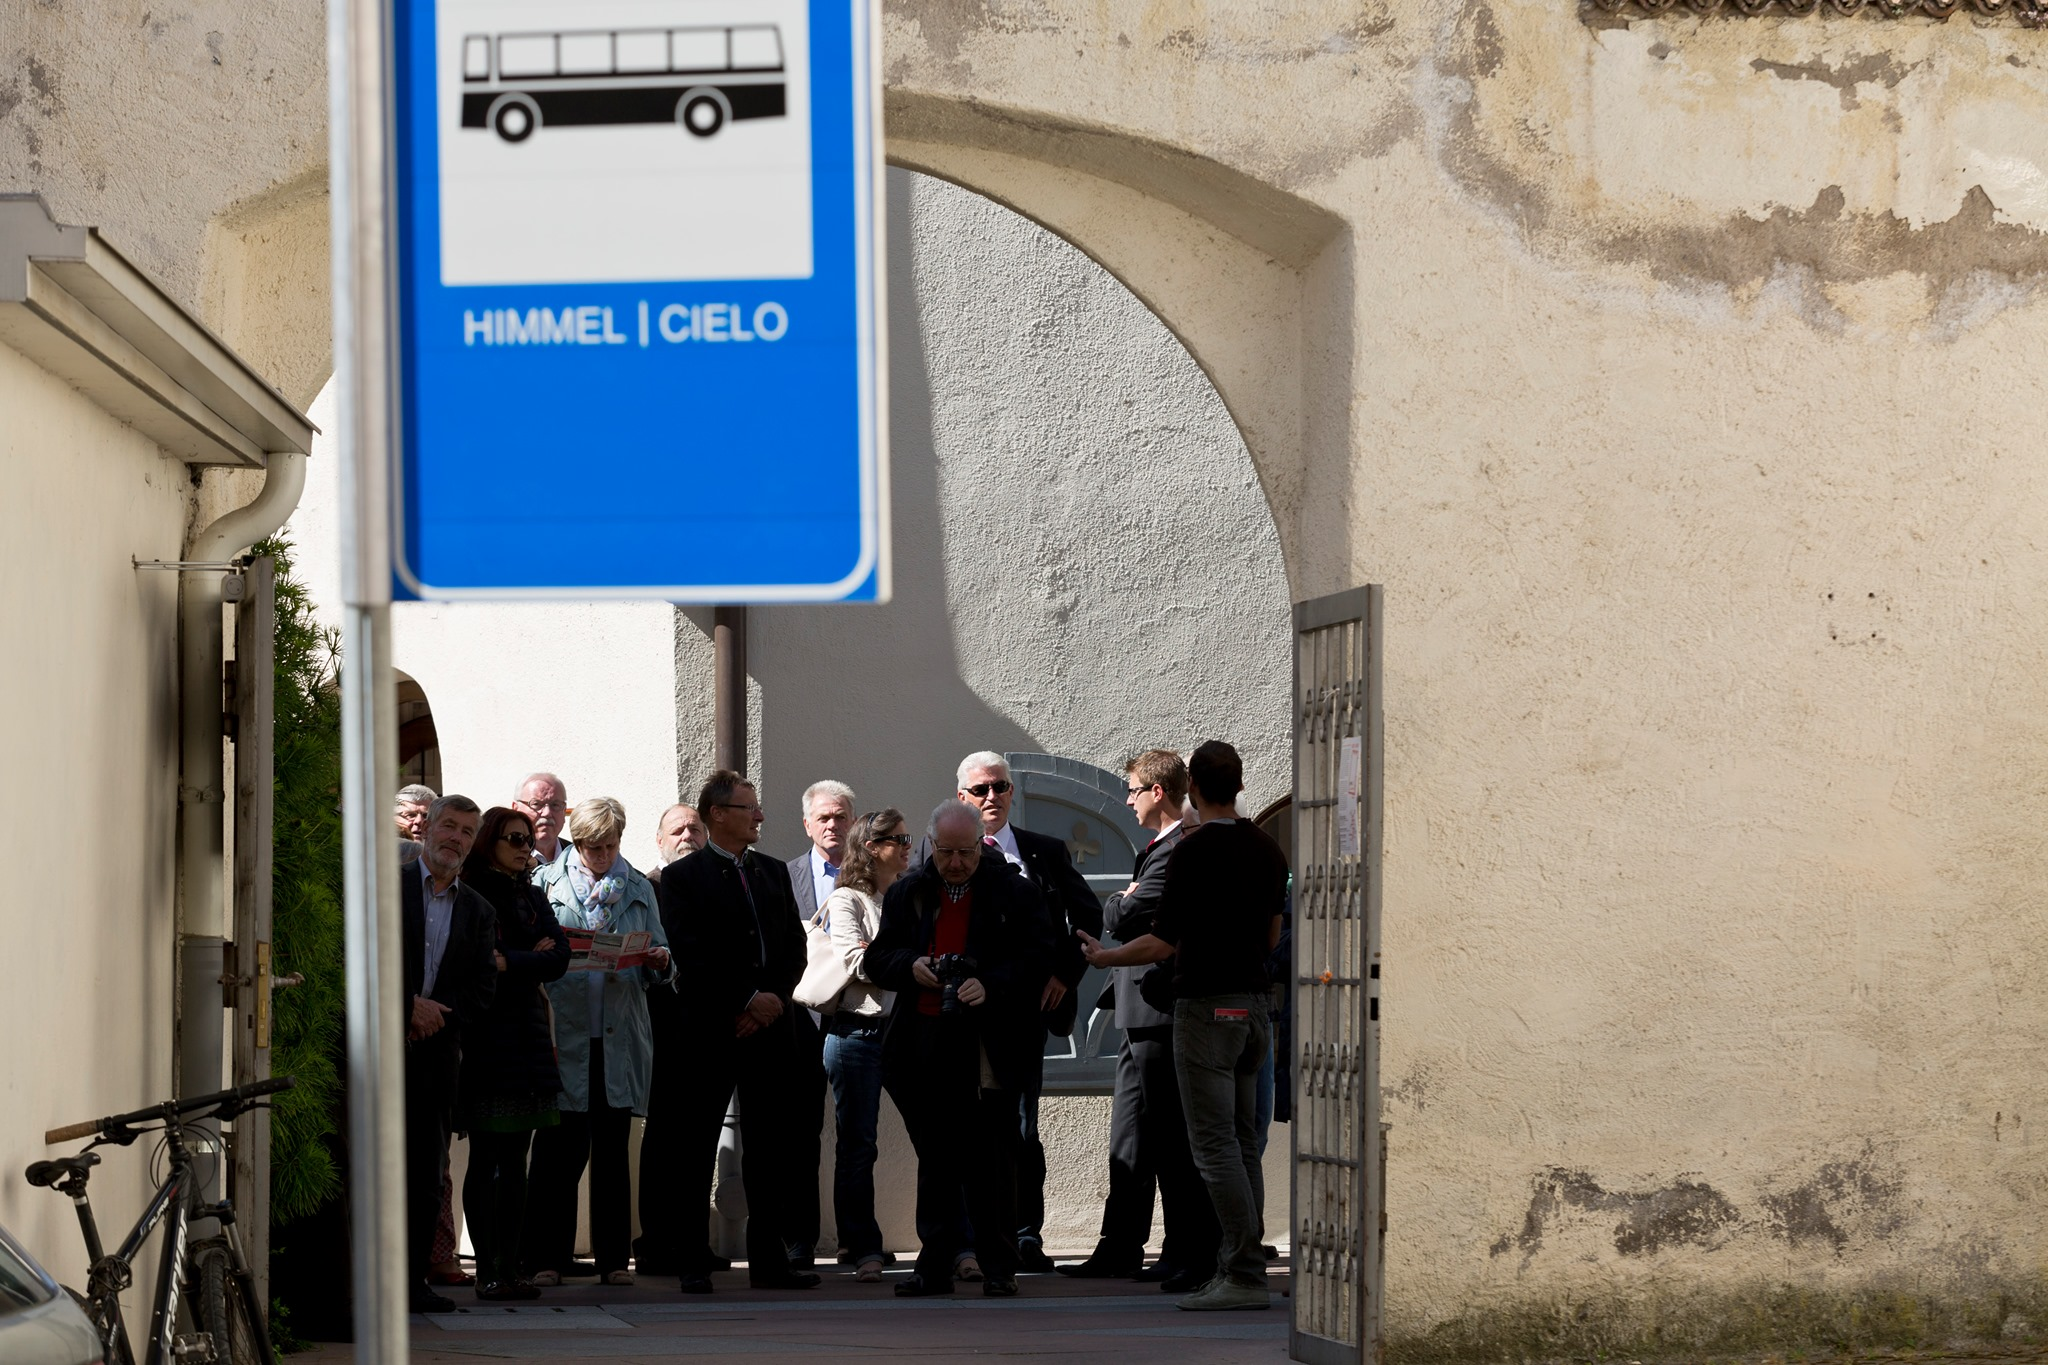 Joachim Knobloch, Final Destination (2013) Foto: Damian Pertoll